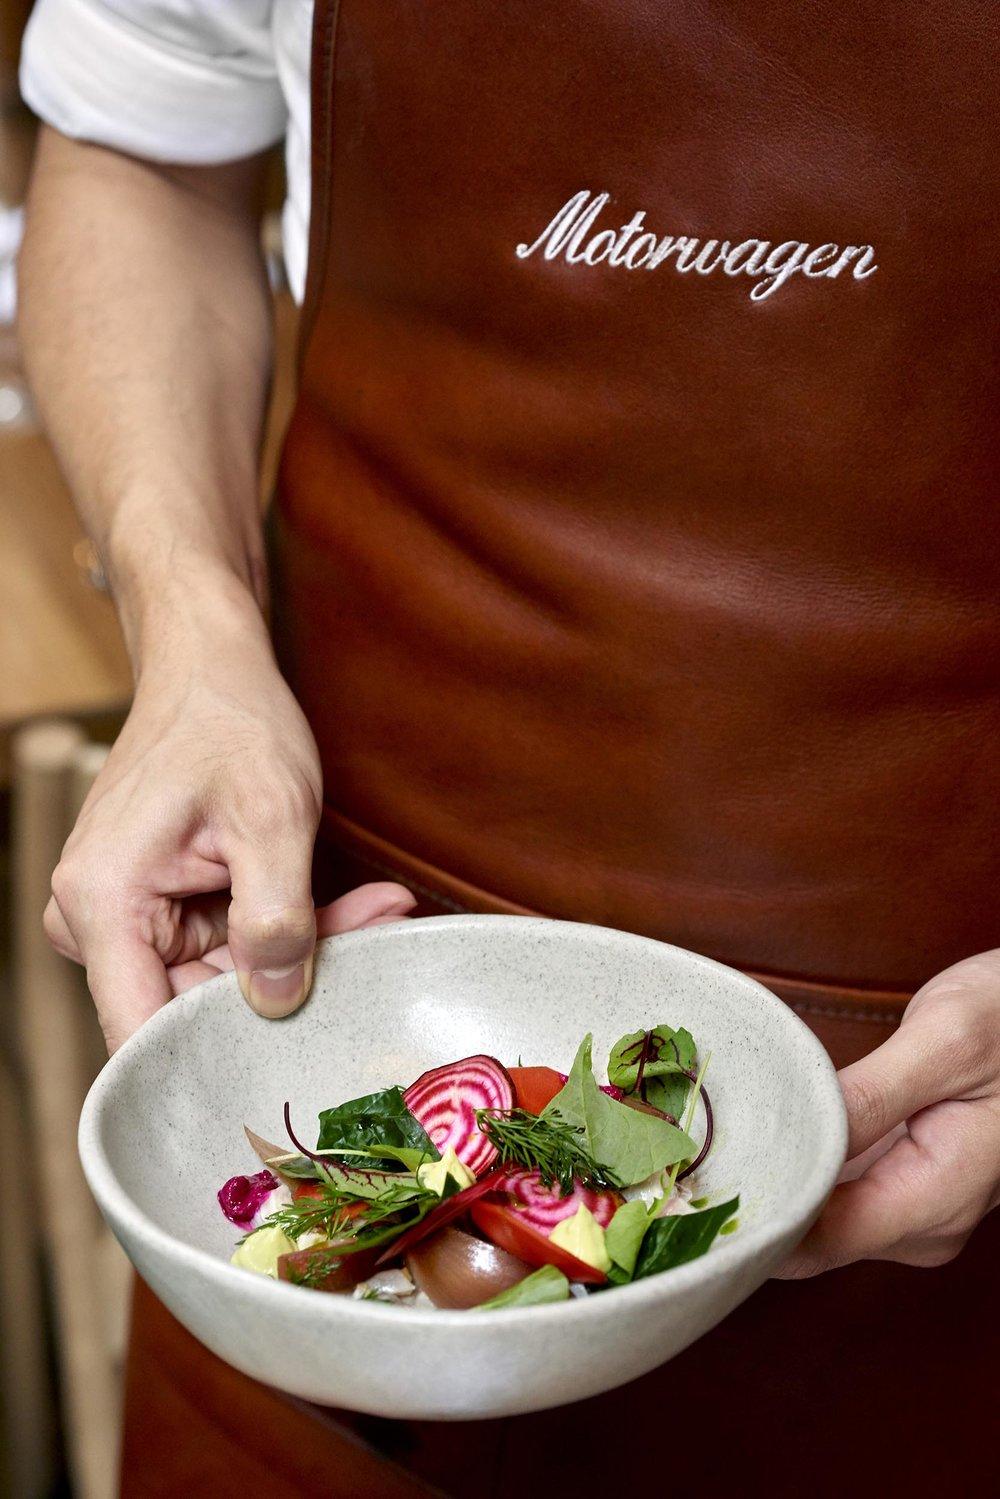 Motorwagen Salad - Brisbane Advertising Photography, Brisbane Commercial Photography.jpg